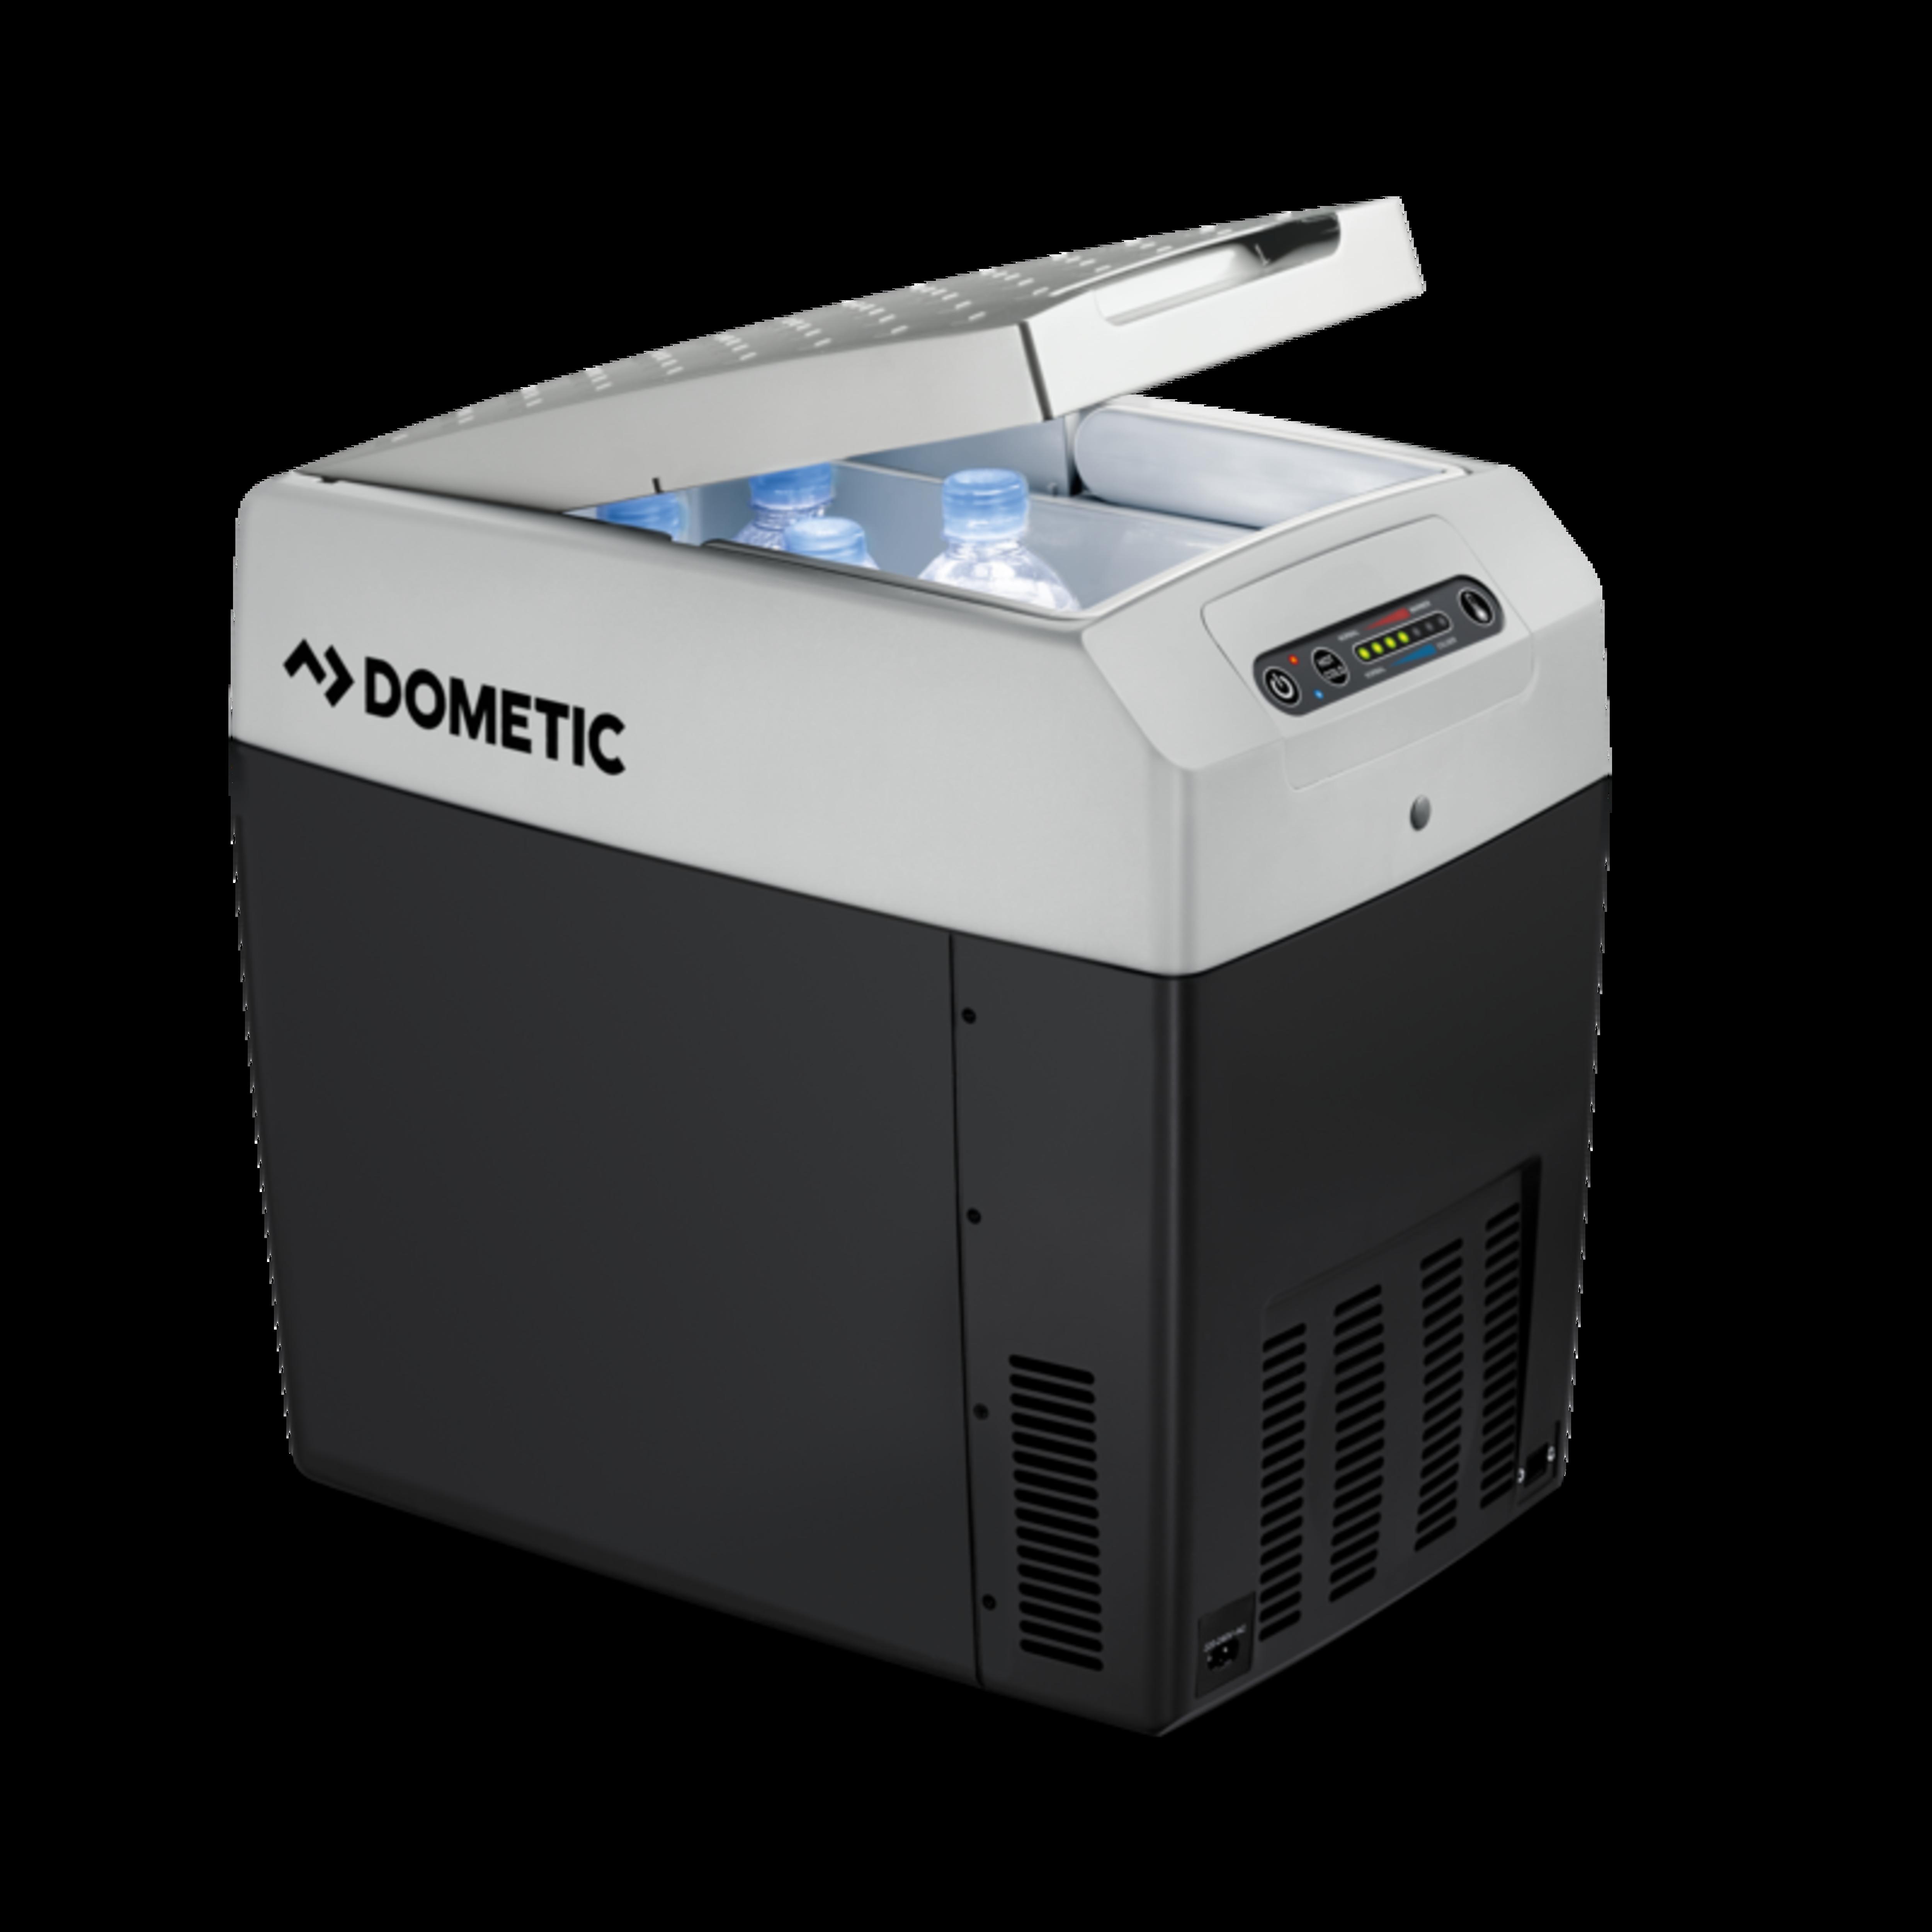 Dometic TropiCool TCX 21 Professional